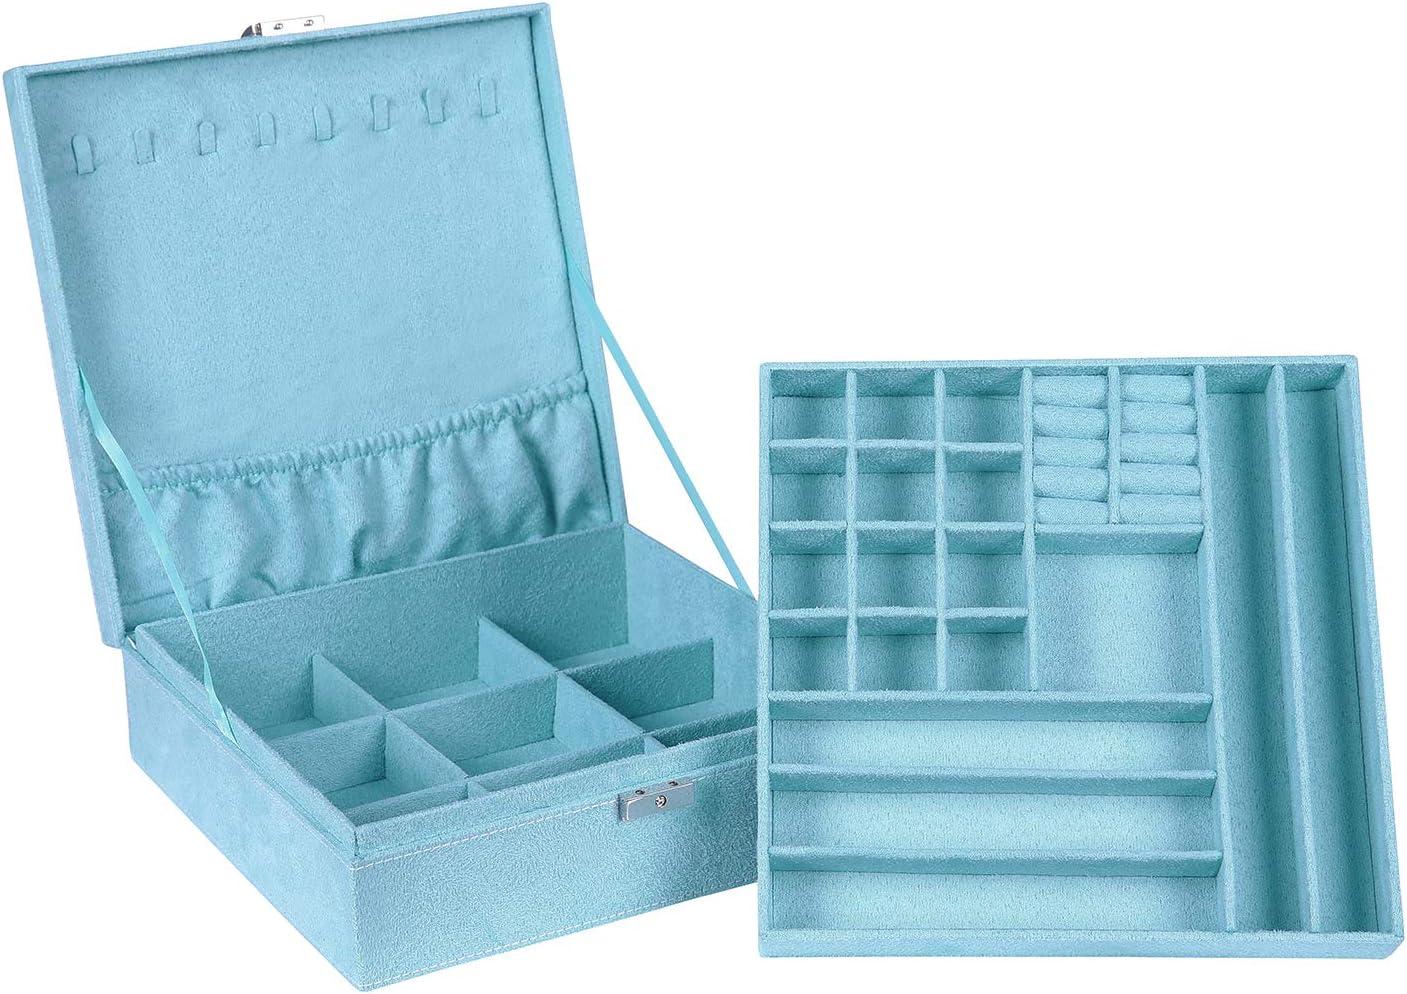 Jewelry Box Two-Layer Lint Jewelry Case Organizer Women Earring Necklace Bracelet Display Storage Box with Lock, Blue